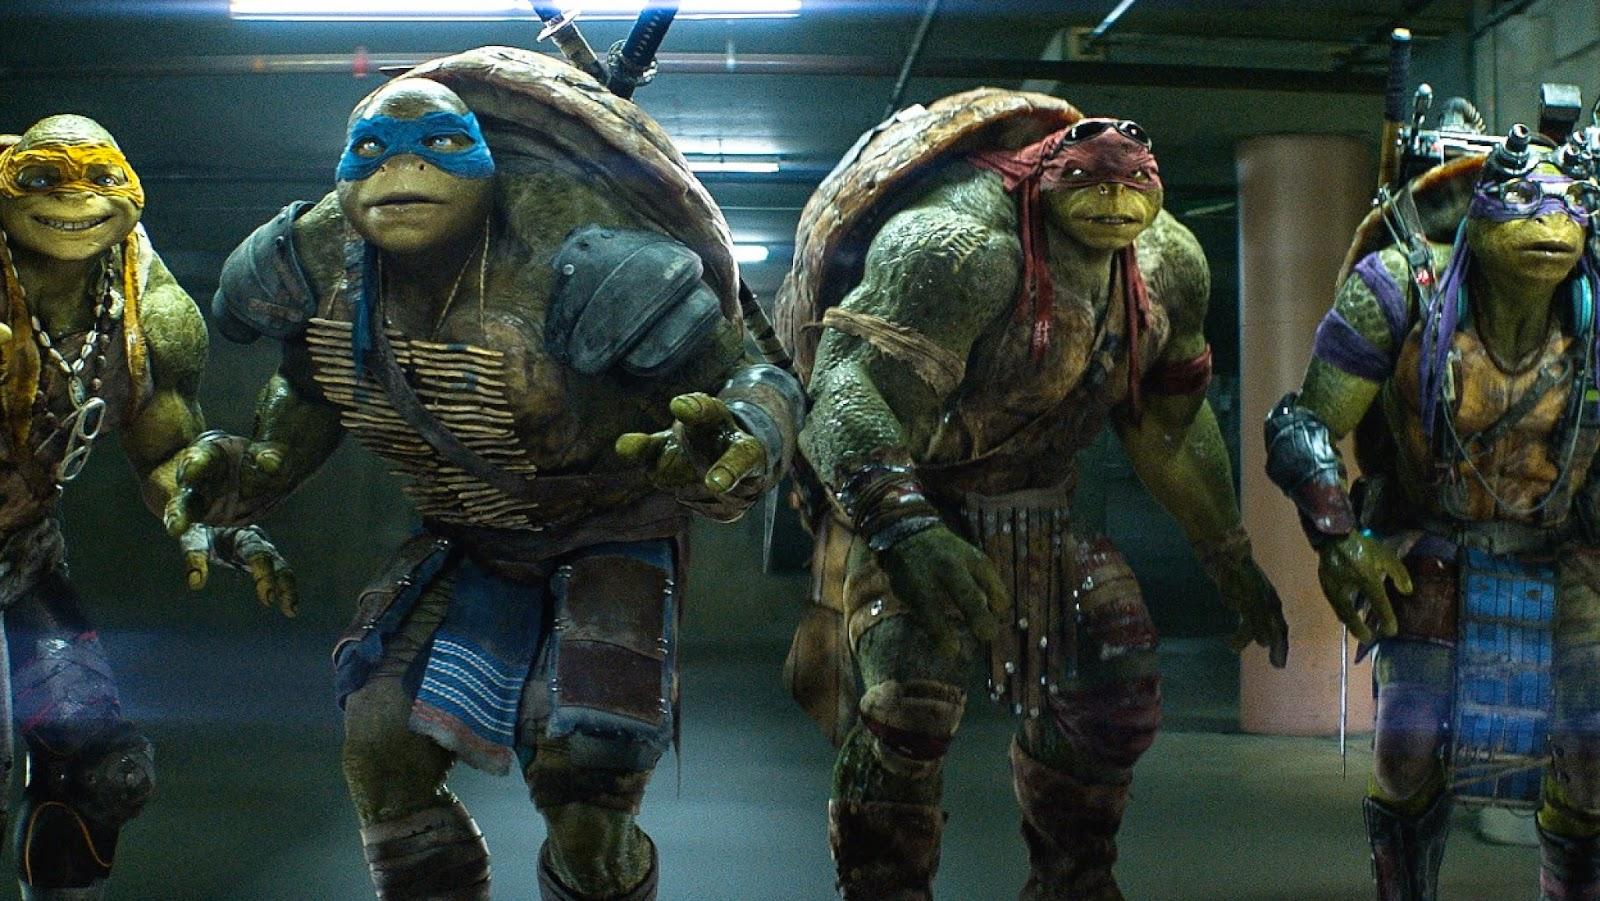 Rise of the Teenage Mutant Ninja Turtles : John Cena Joins Cast As New Villain.